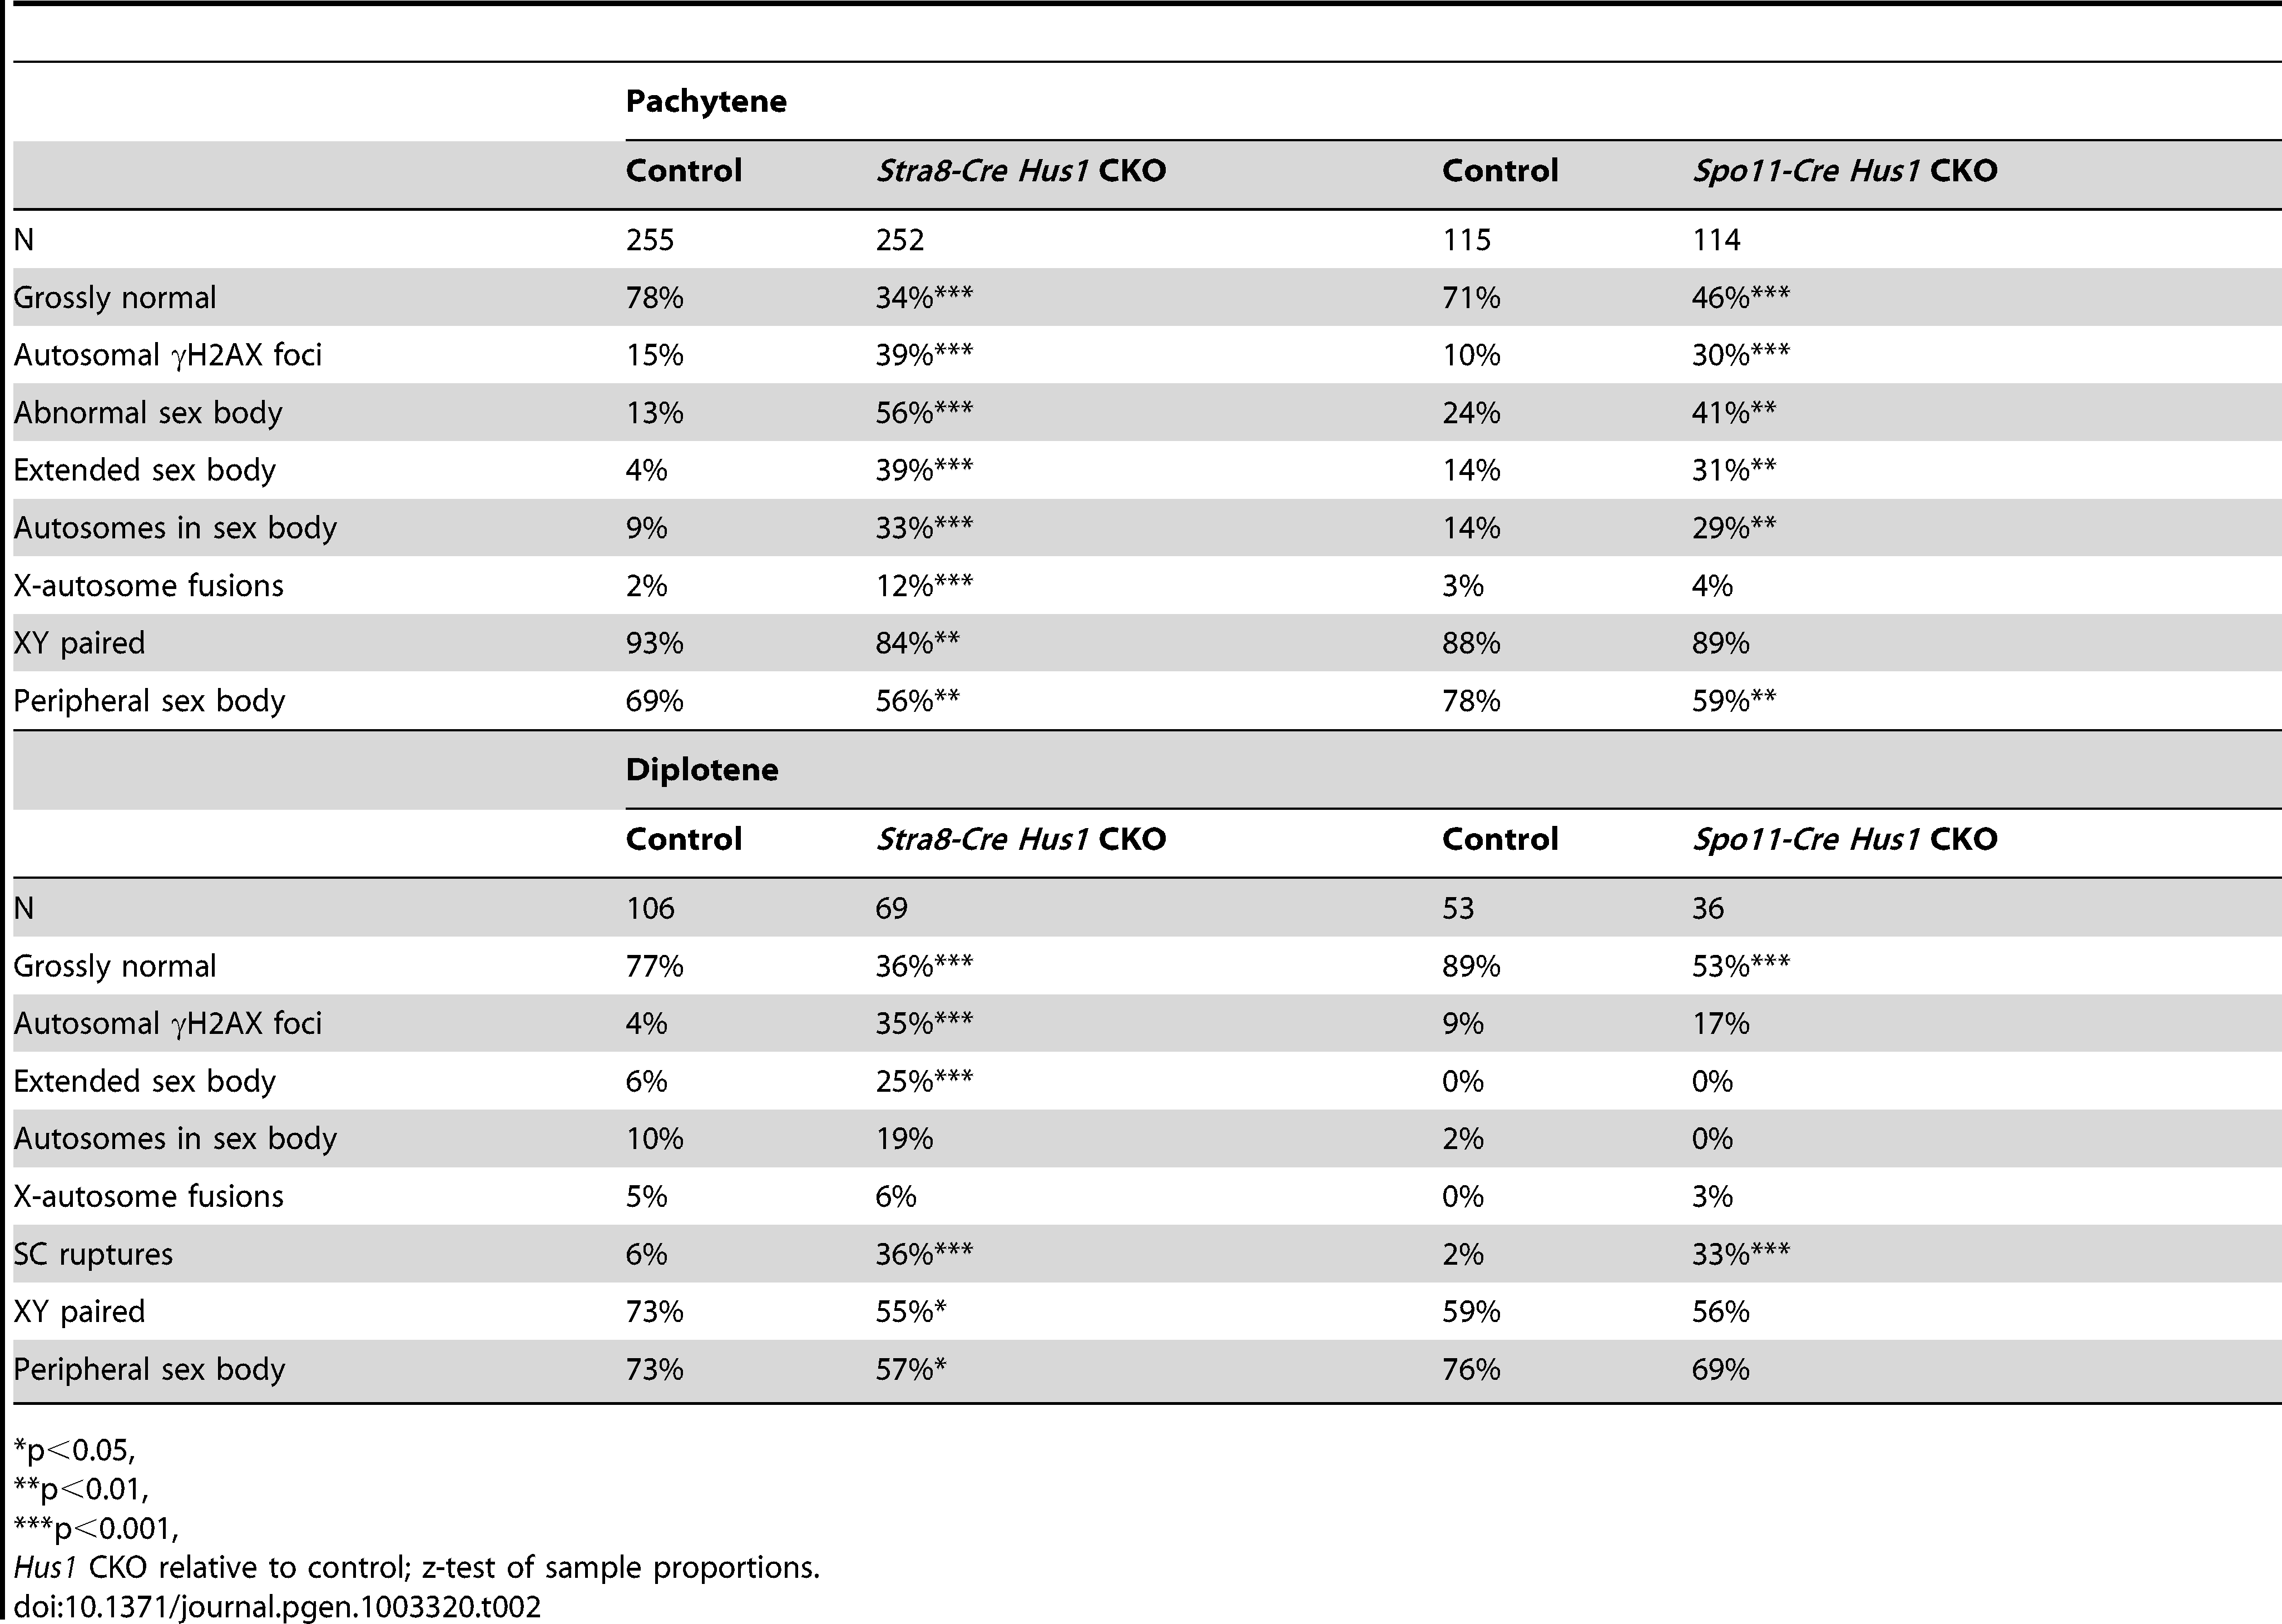 Patterns of γH2AX localization in <i>Stra8-Cre</i> and <i>Spo11-Cre Hus1</i> CKO spermatocytes.